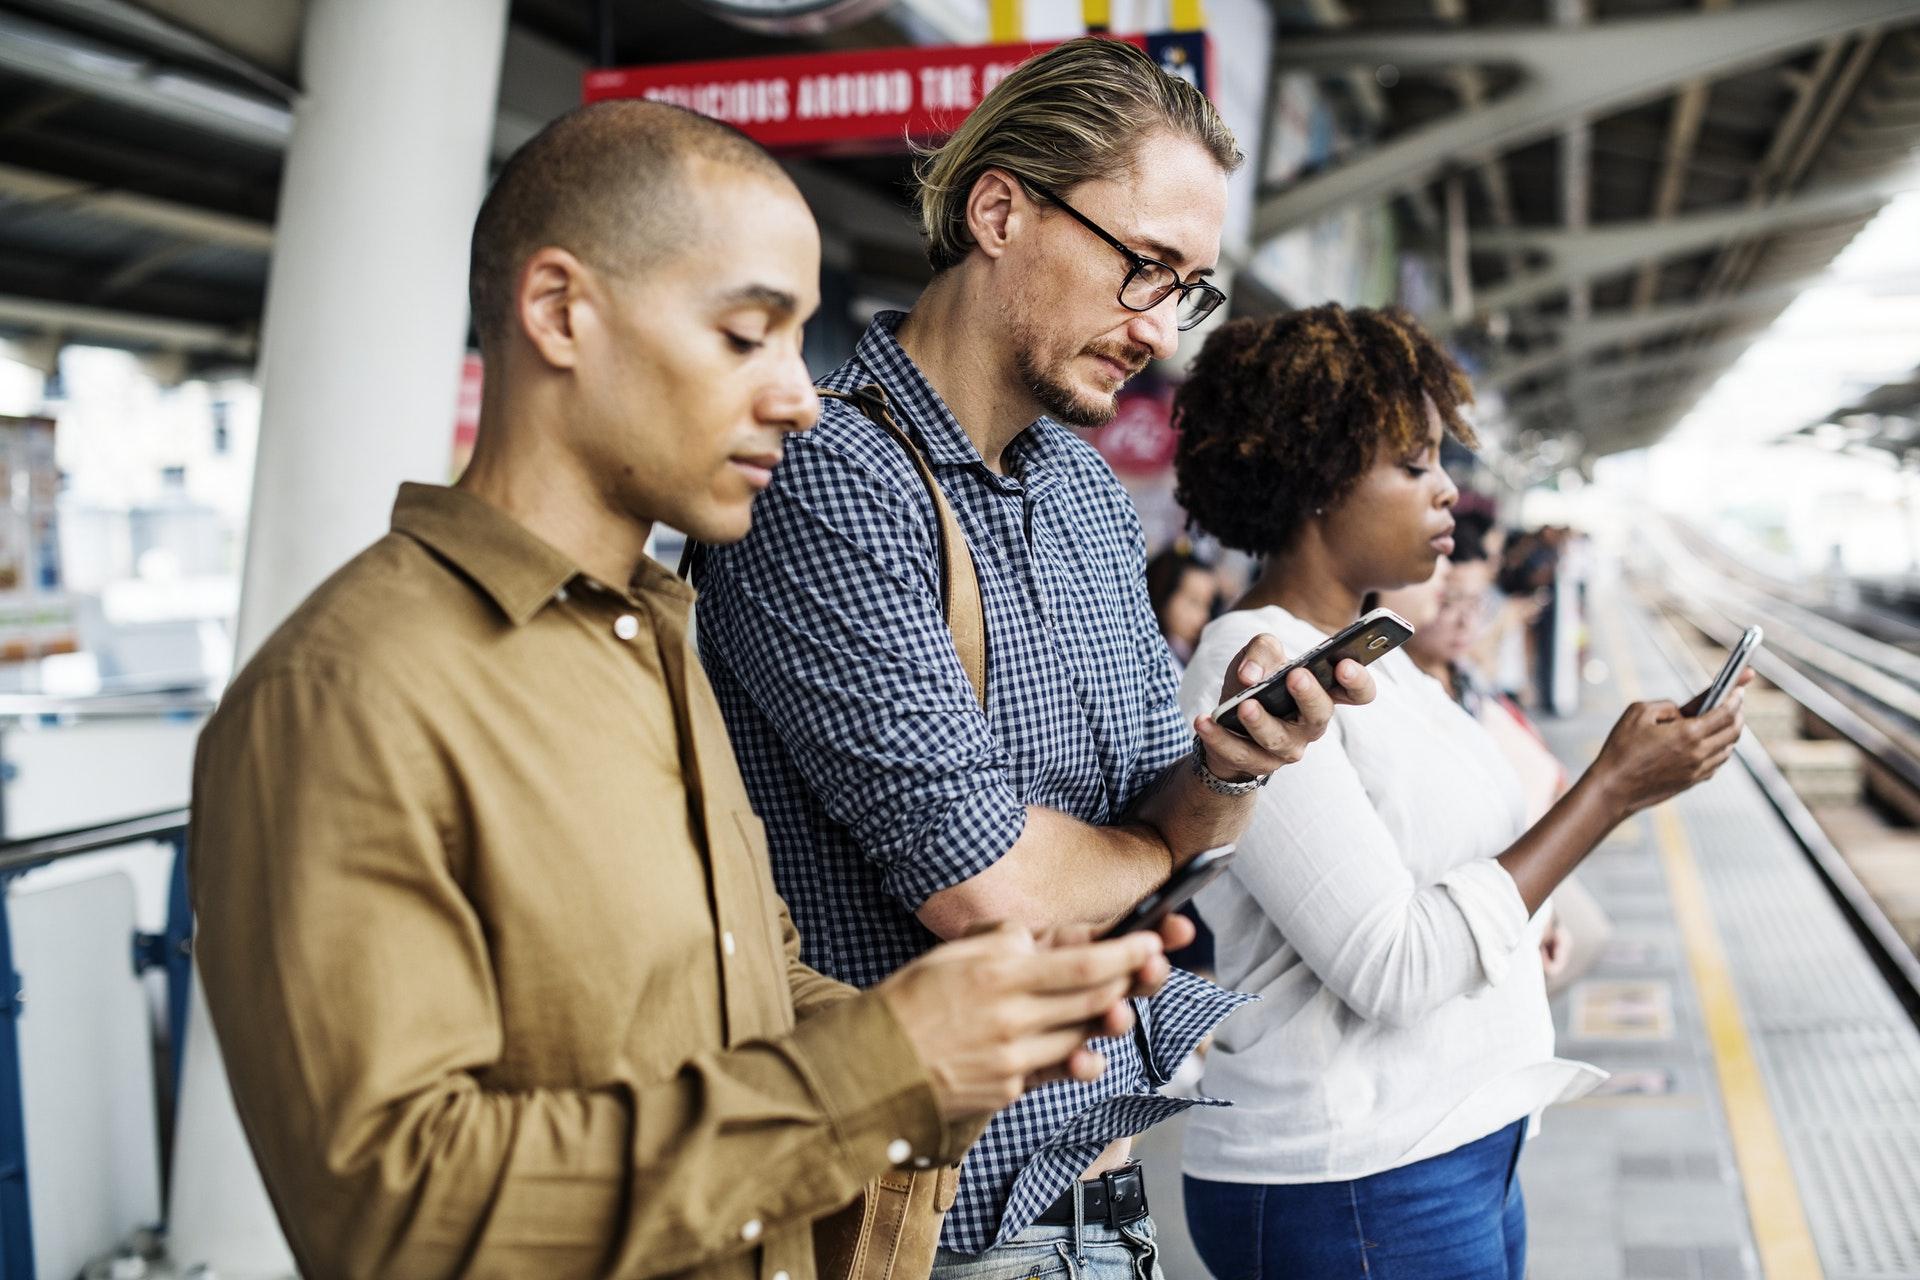 Digital media opens new doors for ministry